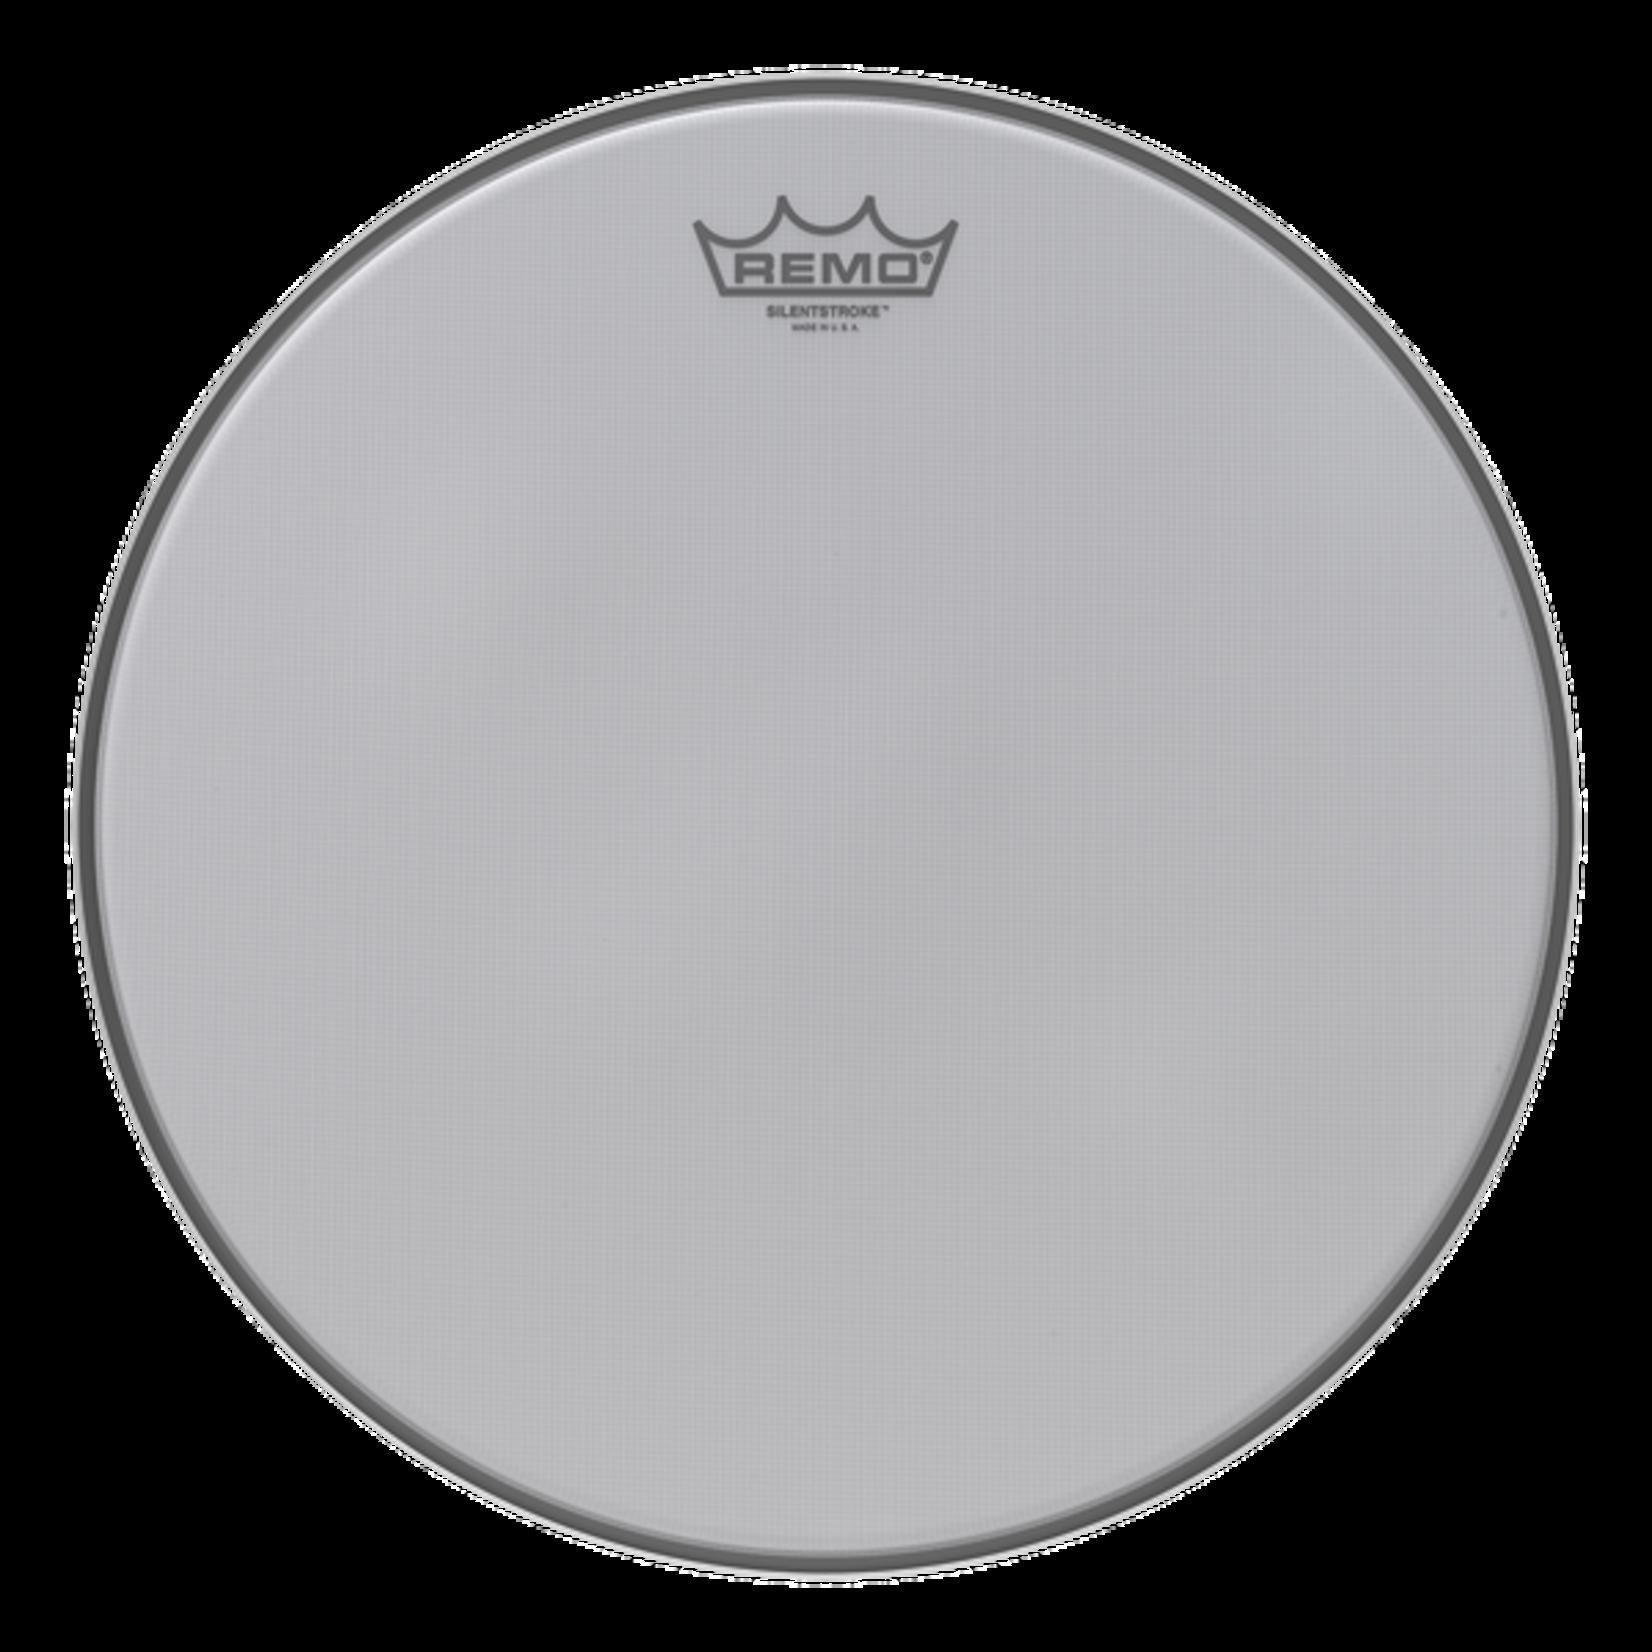 Remo Remo Silentstroke Bass Drum